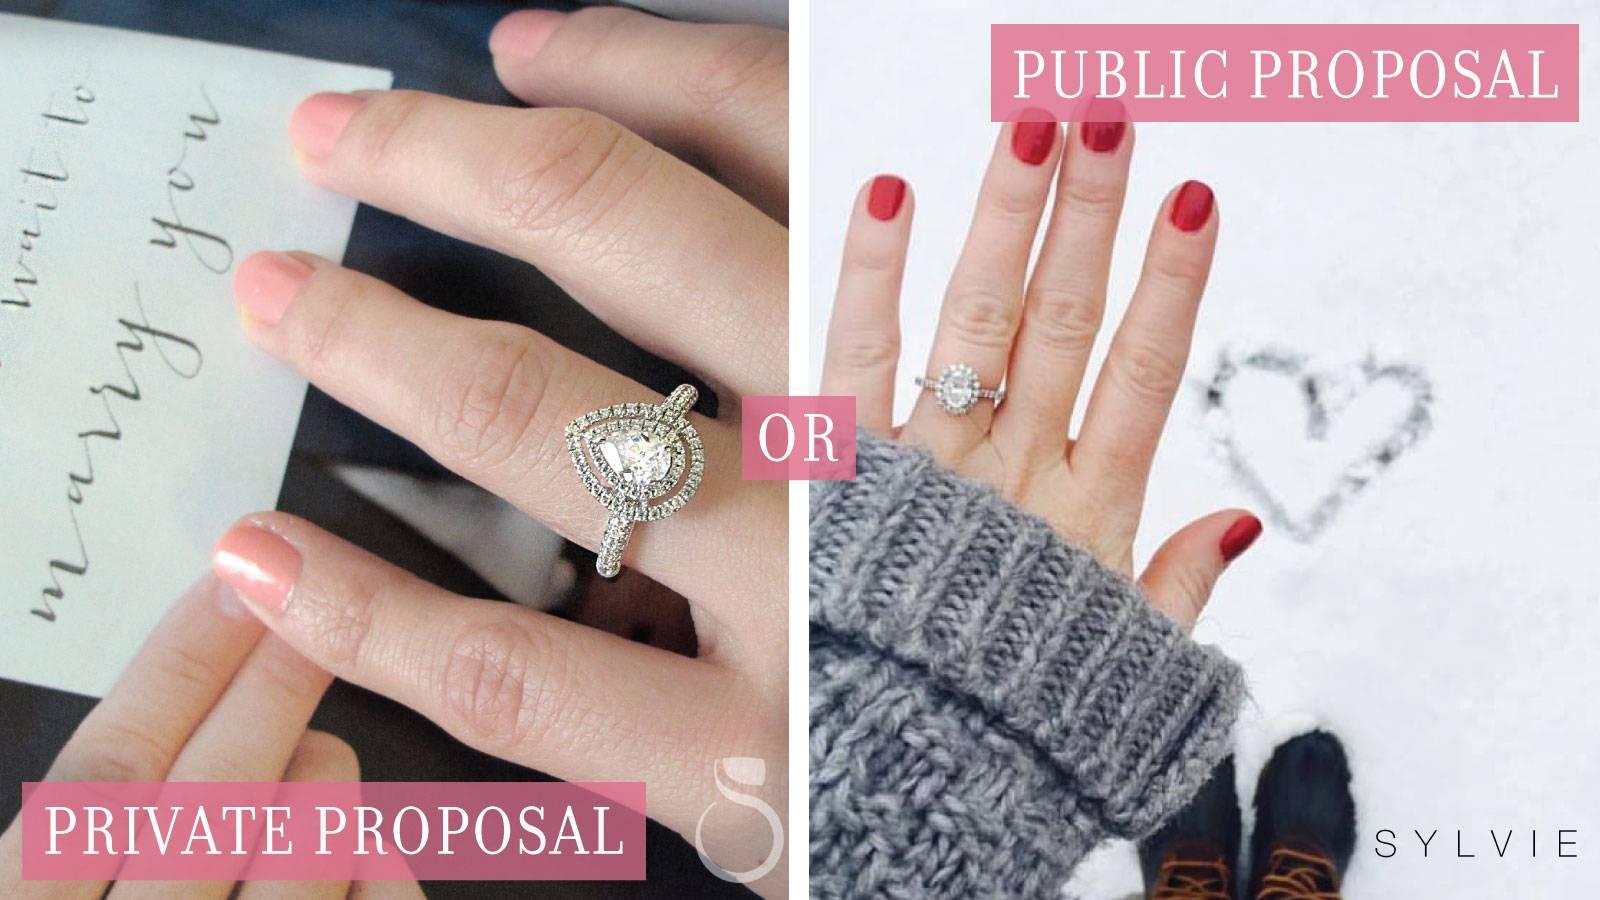 Valentine's Day Proposals: Private or Public?